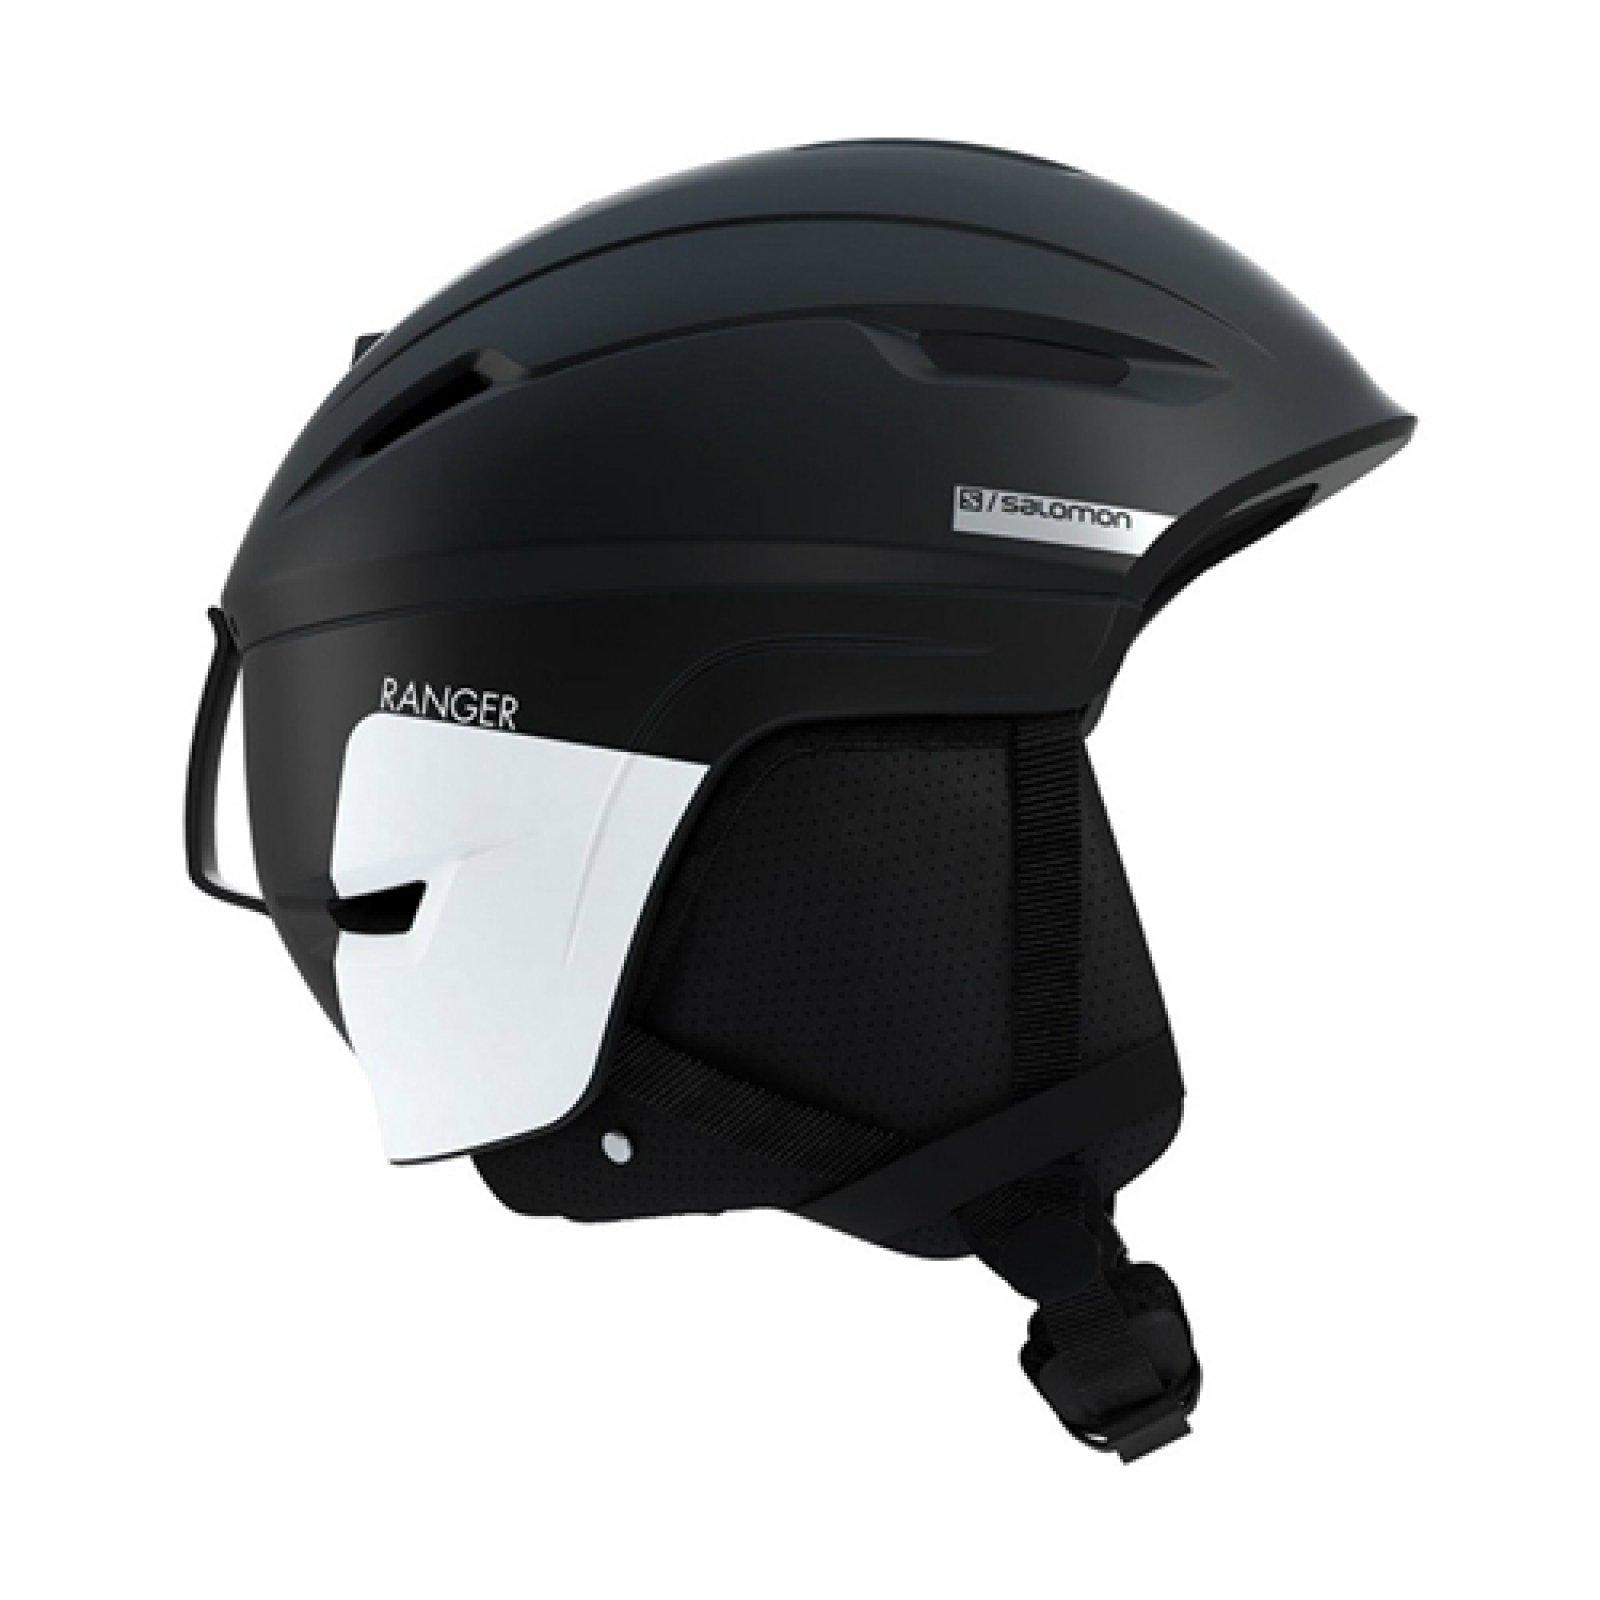 Salomon RANGER ACCESS C.AIR SMU 18/19 Velikost helmy: L 59-62